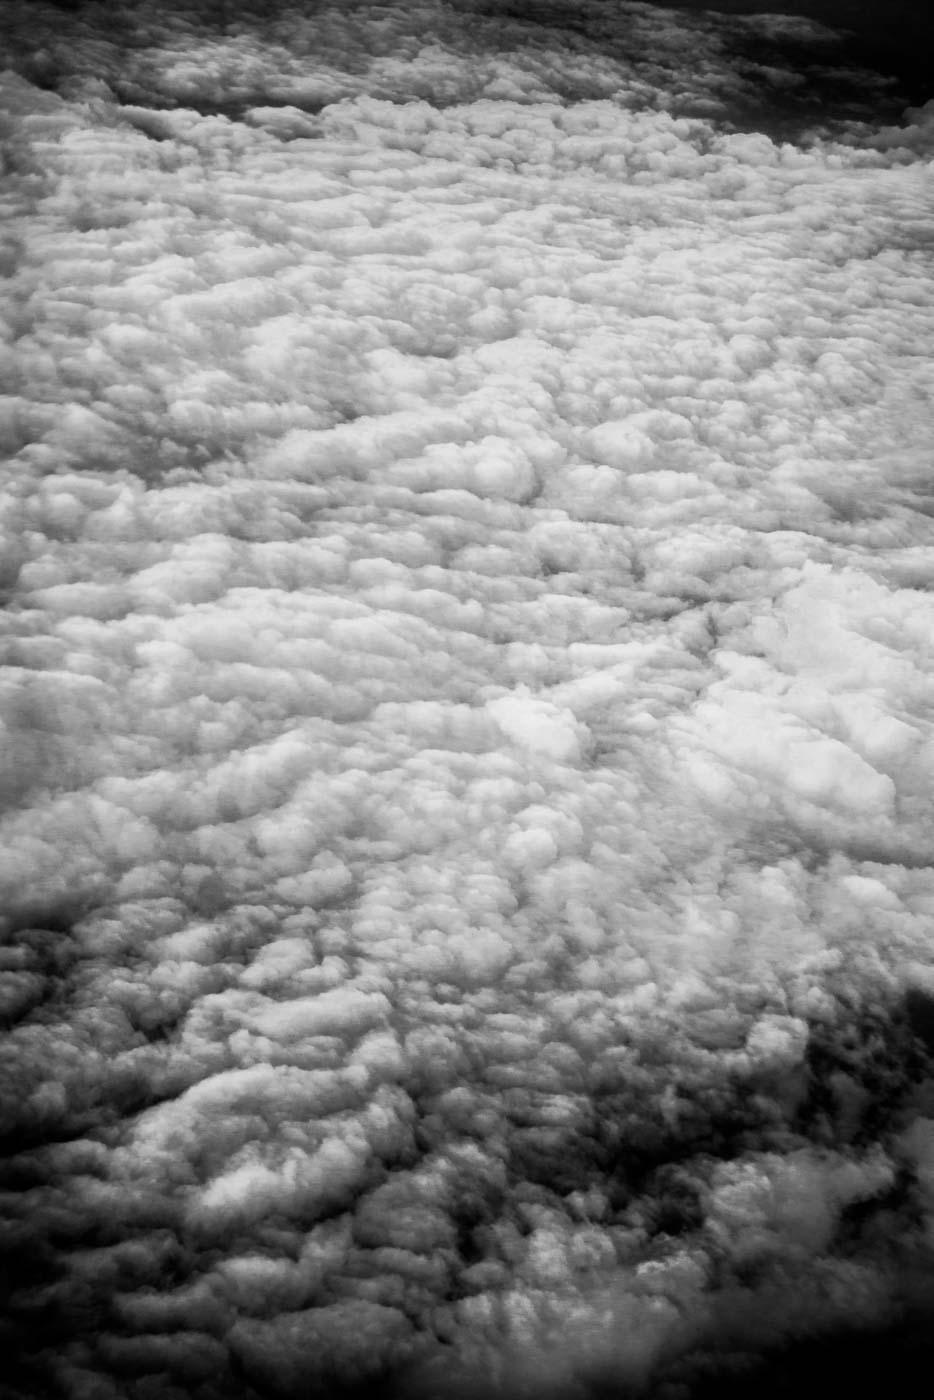 Cloud field from Delta Airlines 2016 © Robert Welkie